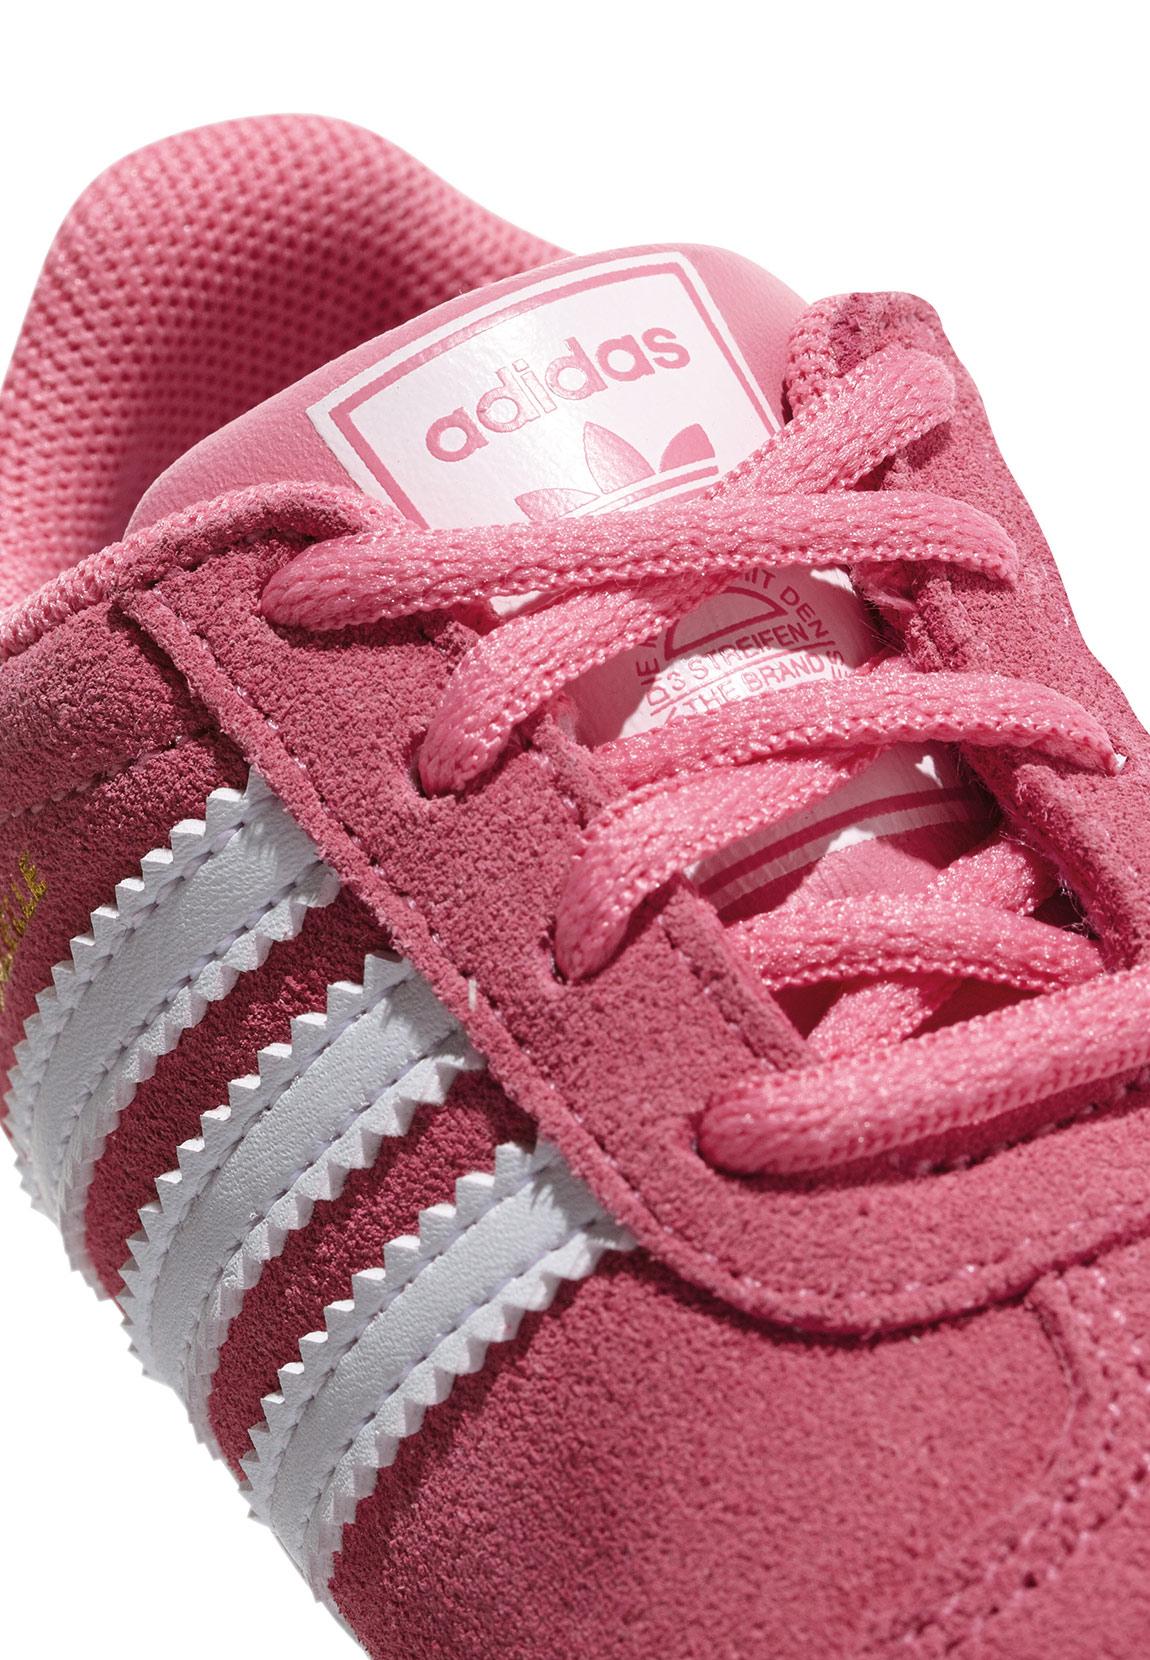 Adidas Schuhe Adidas Baby Adidas Schuhe Rosa Baby Schuhe Rosa Baby Adidas Rosa HWEDY9I2